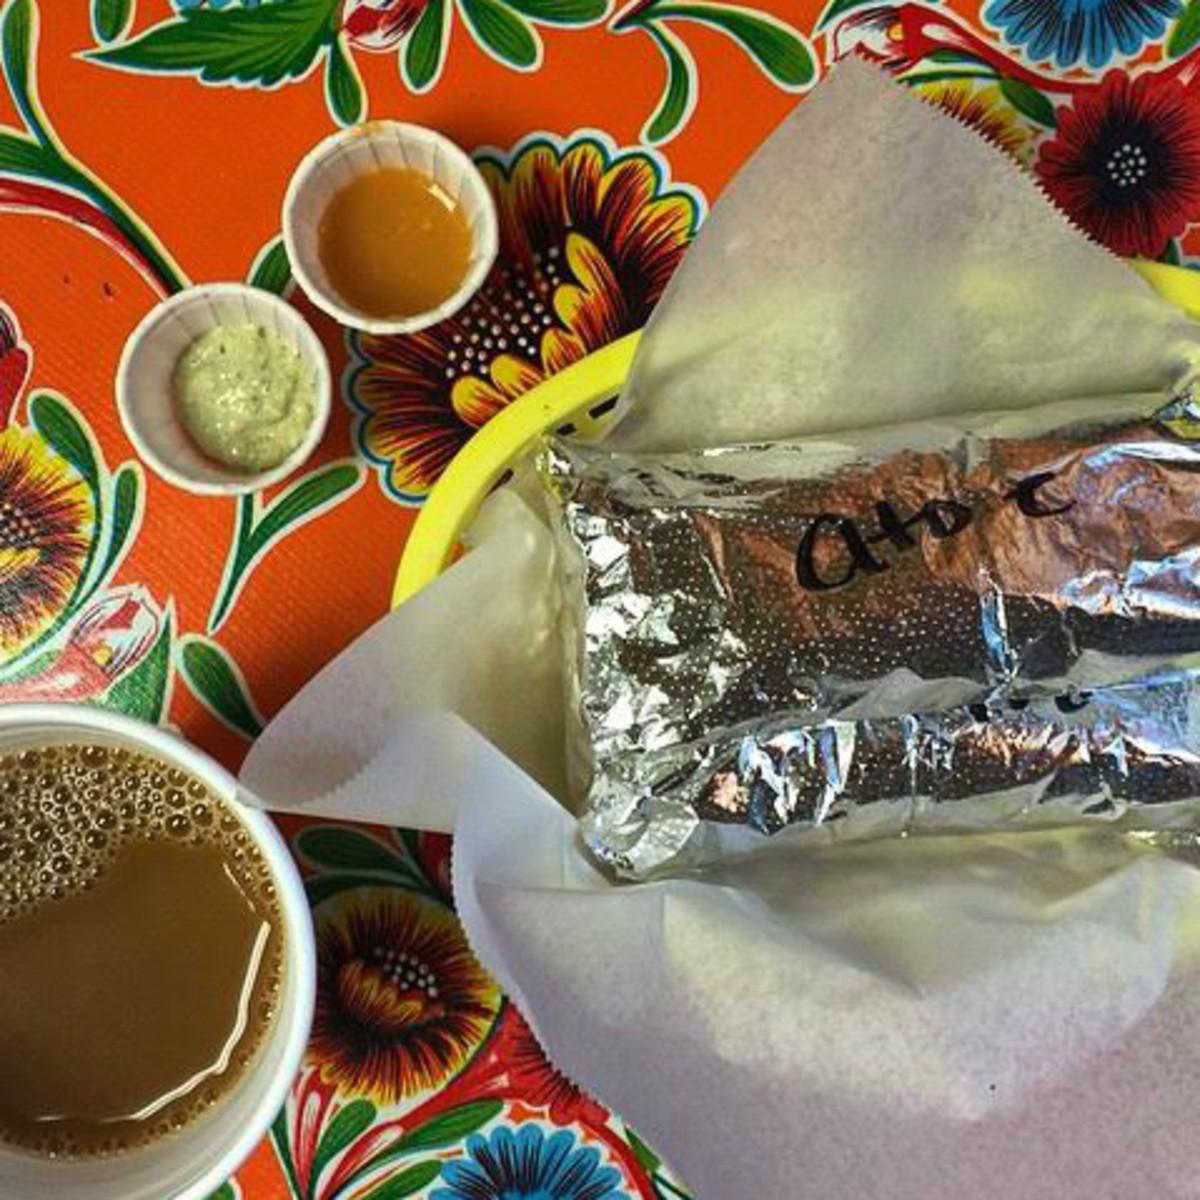 Paco's Taco's taco foil coffee Austin restaurant